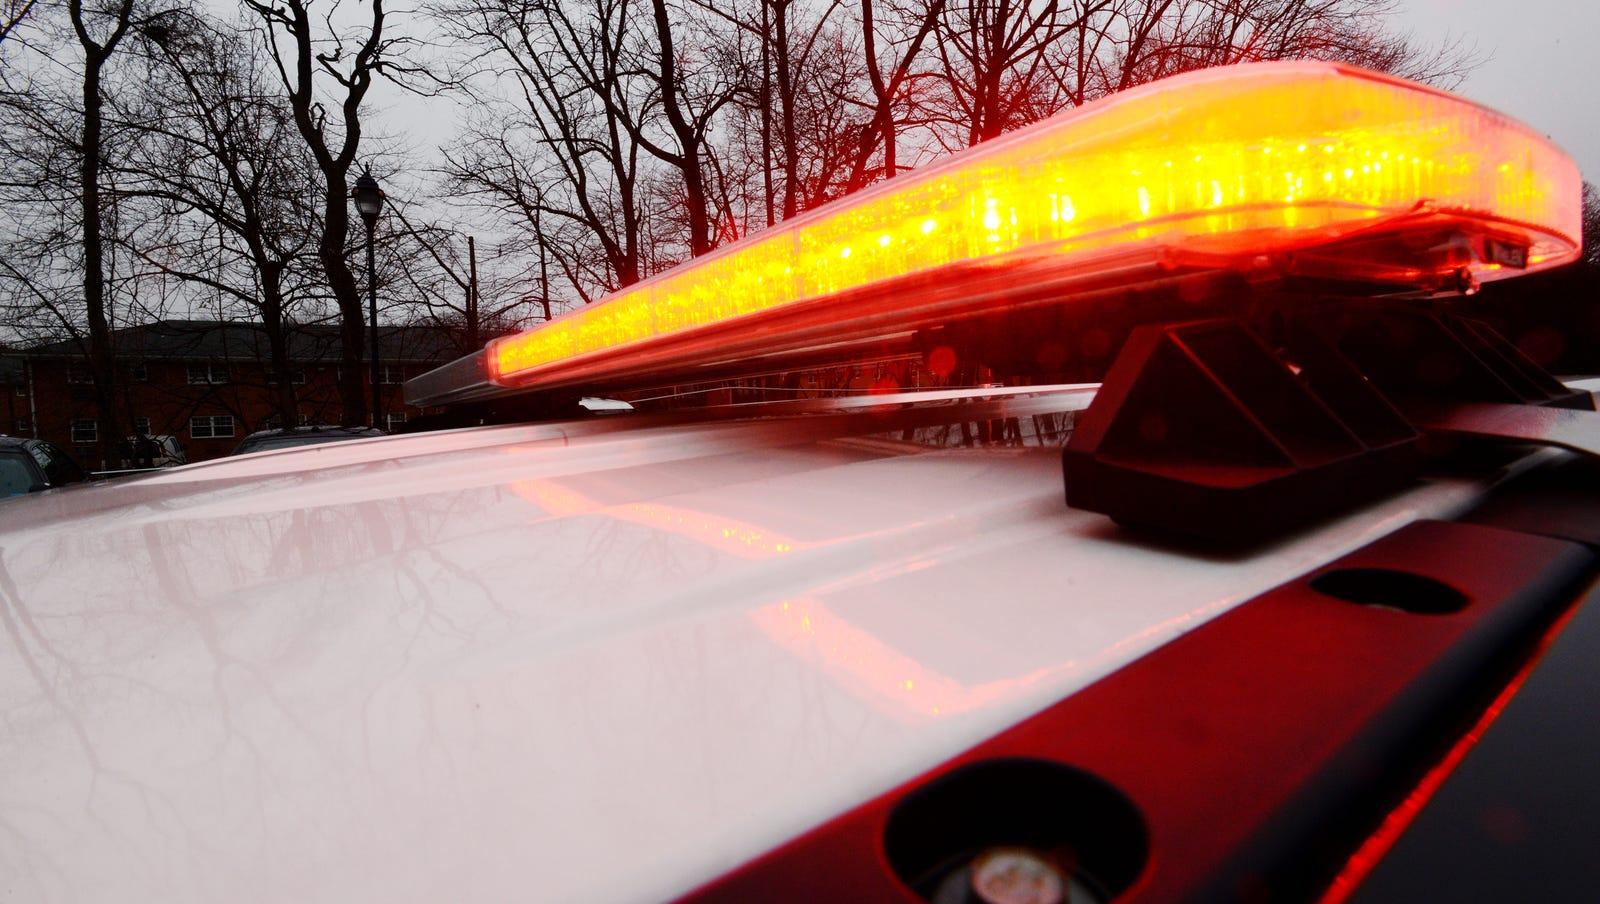 Police: Long Island driver deploys dummy to ride in carpool lane